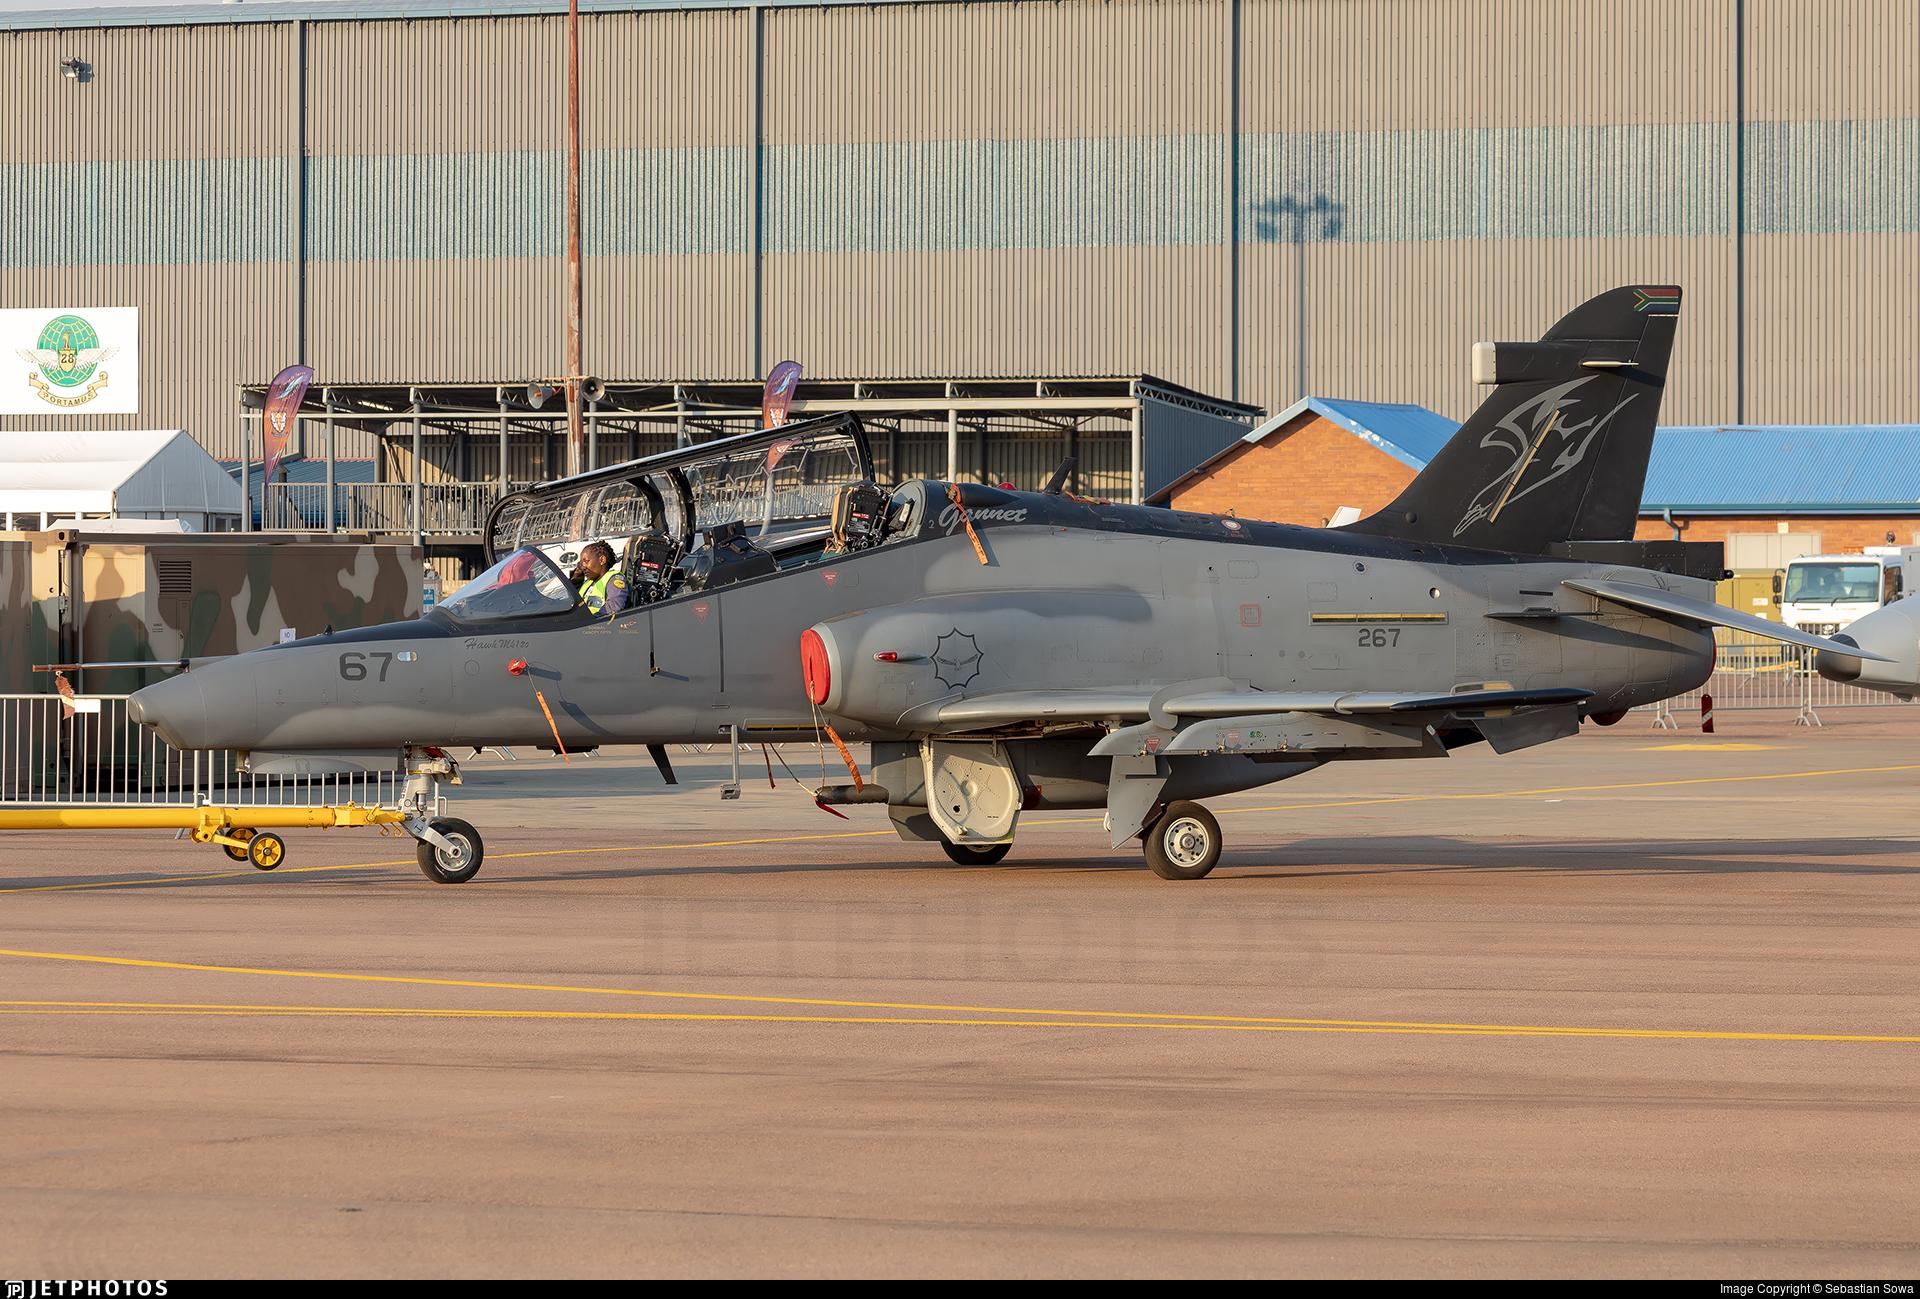 267 - British Aerospace Hawk Mk.120 - South Africa - Air Force